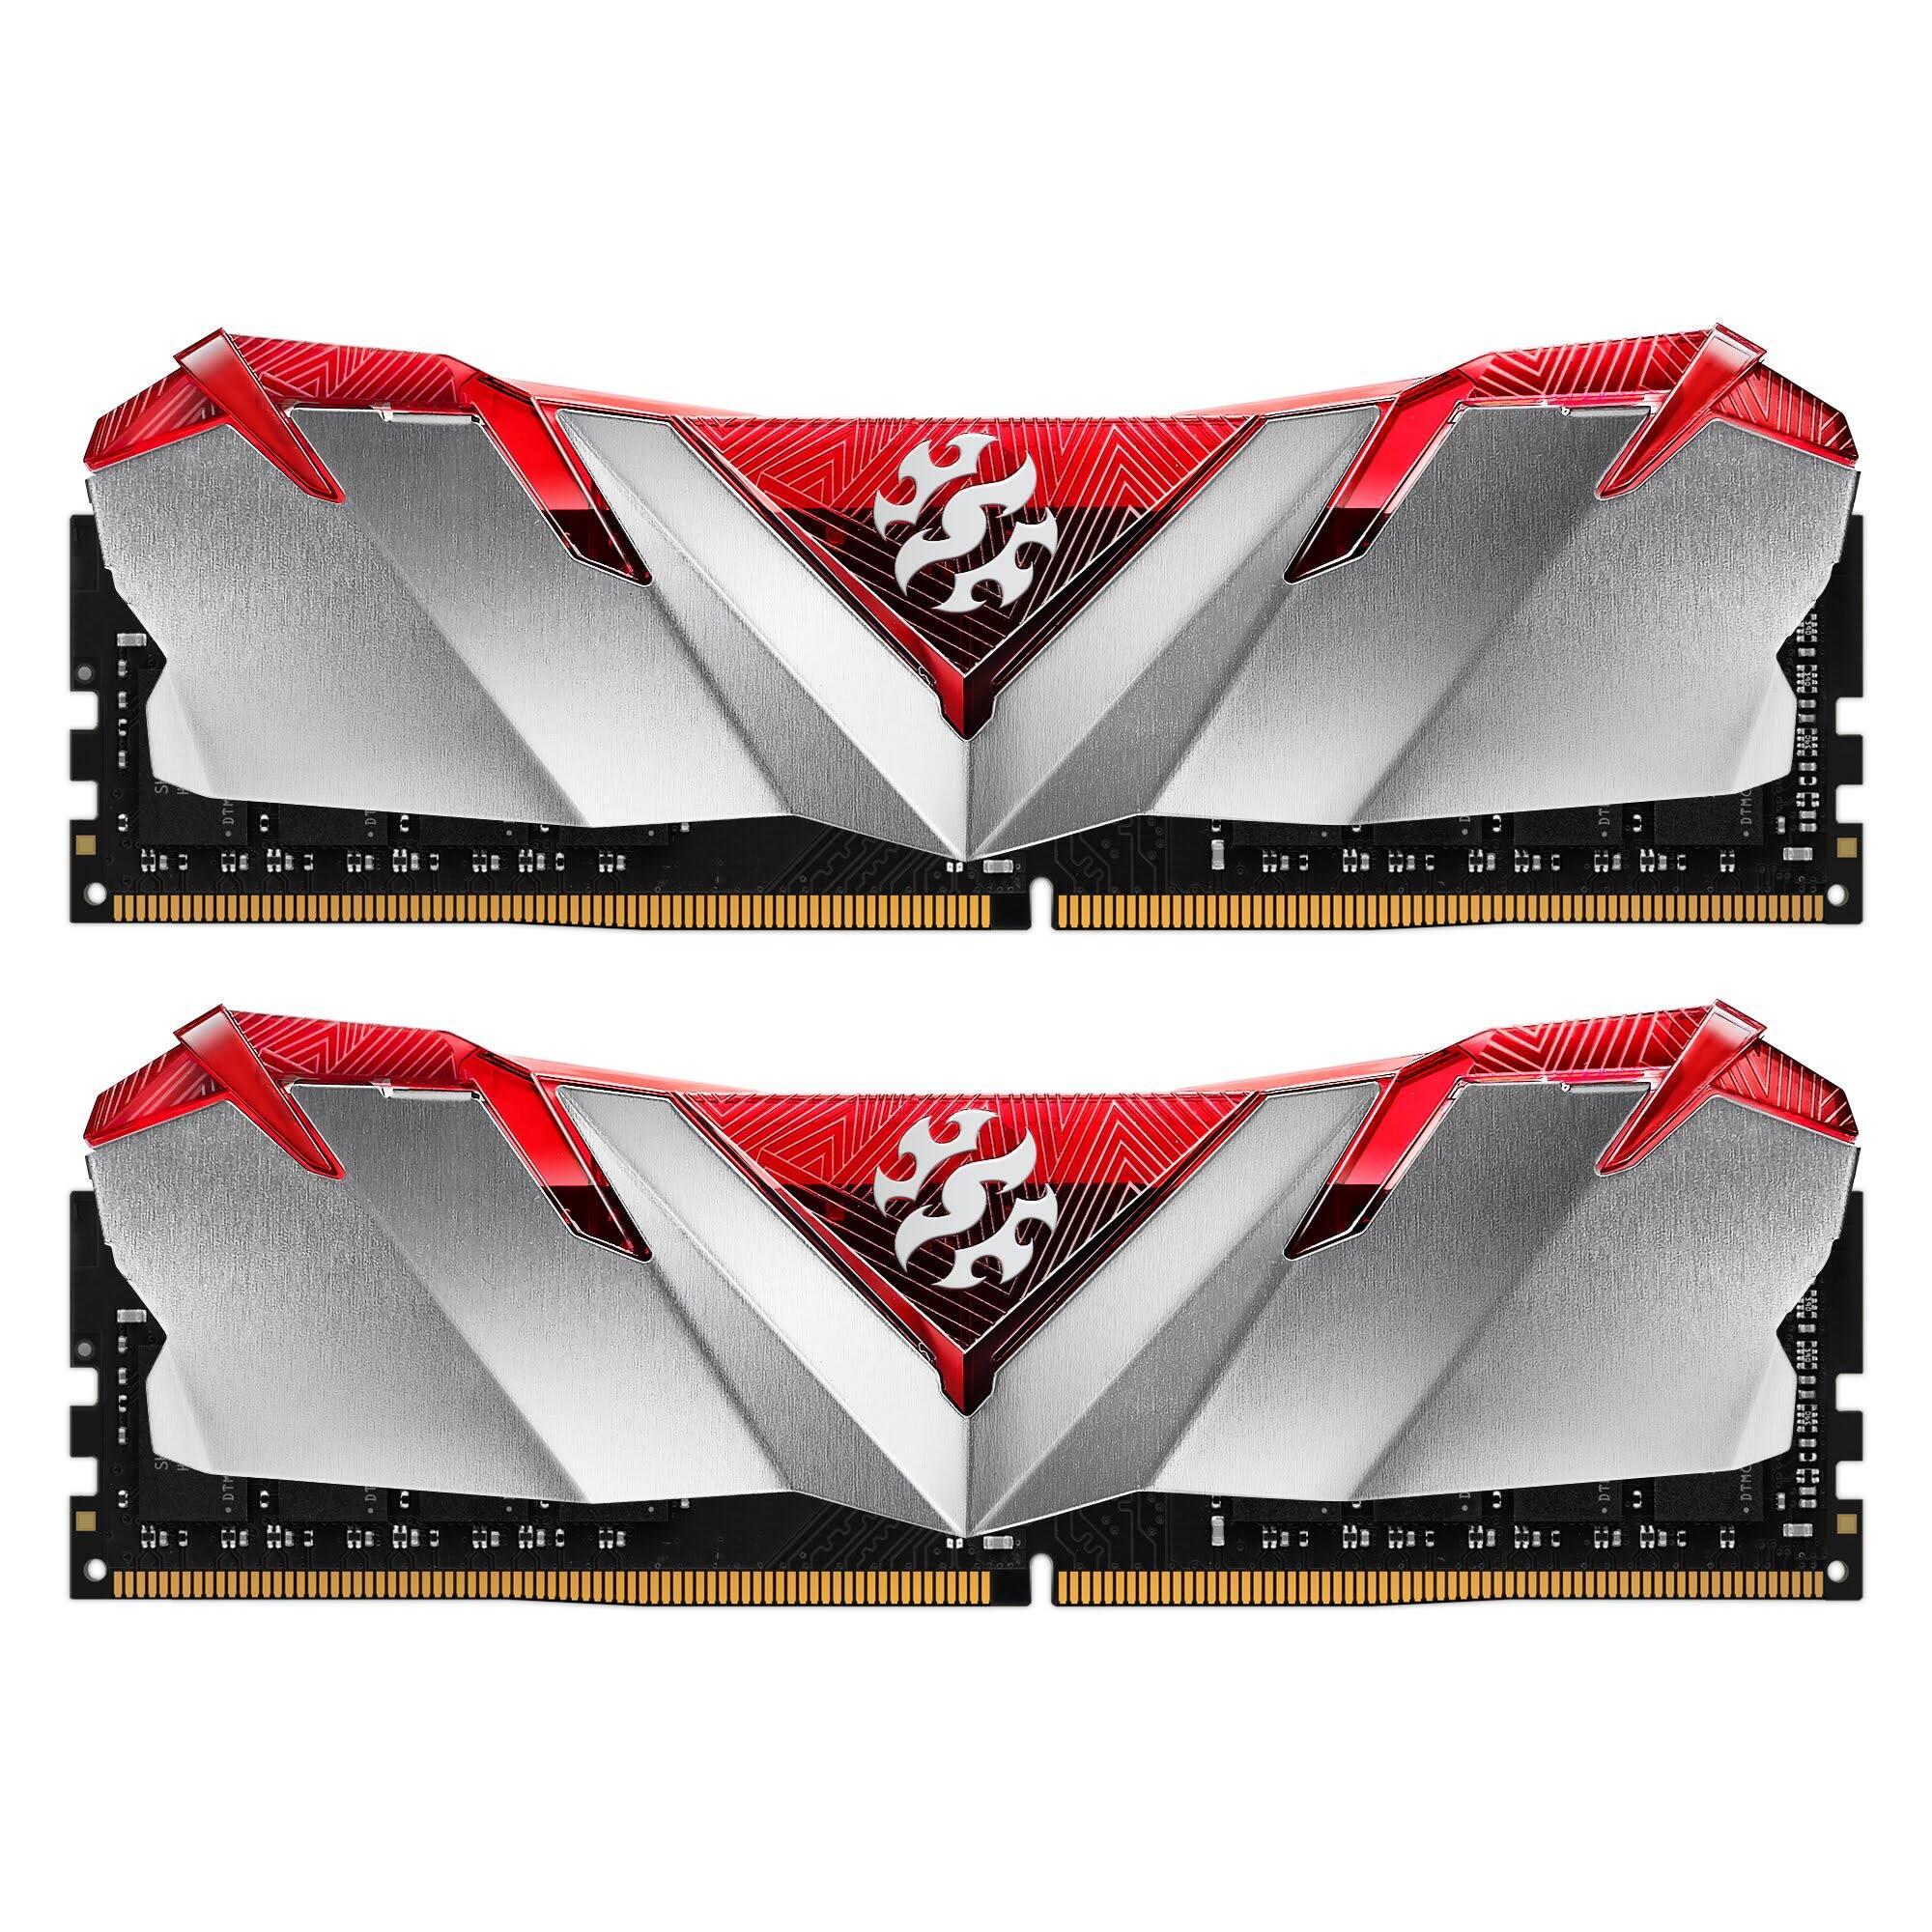 XPG GAMMIX D30 Gaming Memory: 16GB (2x8GB) DDR4 3000MHz CL16 Red or Black $55 + FS